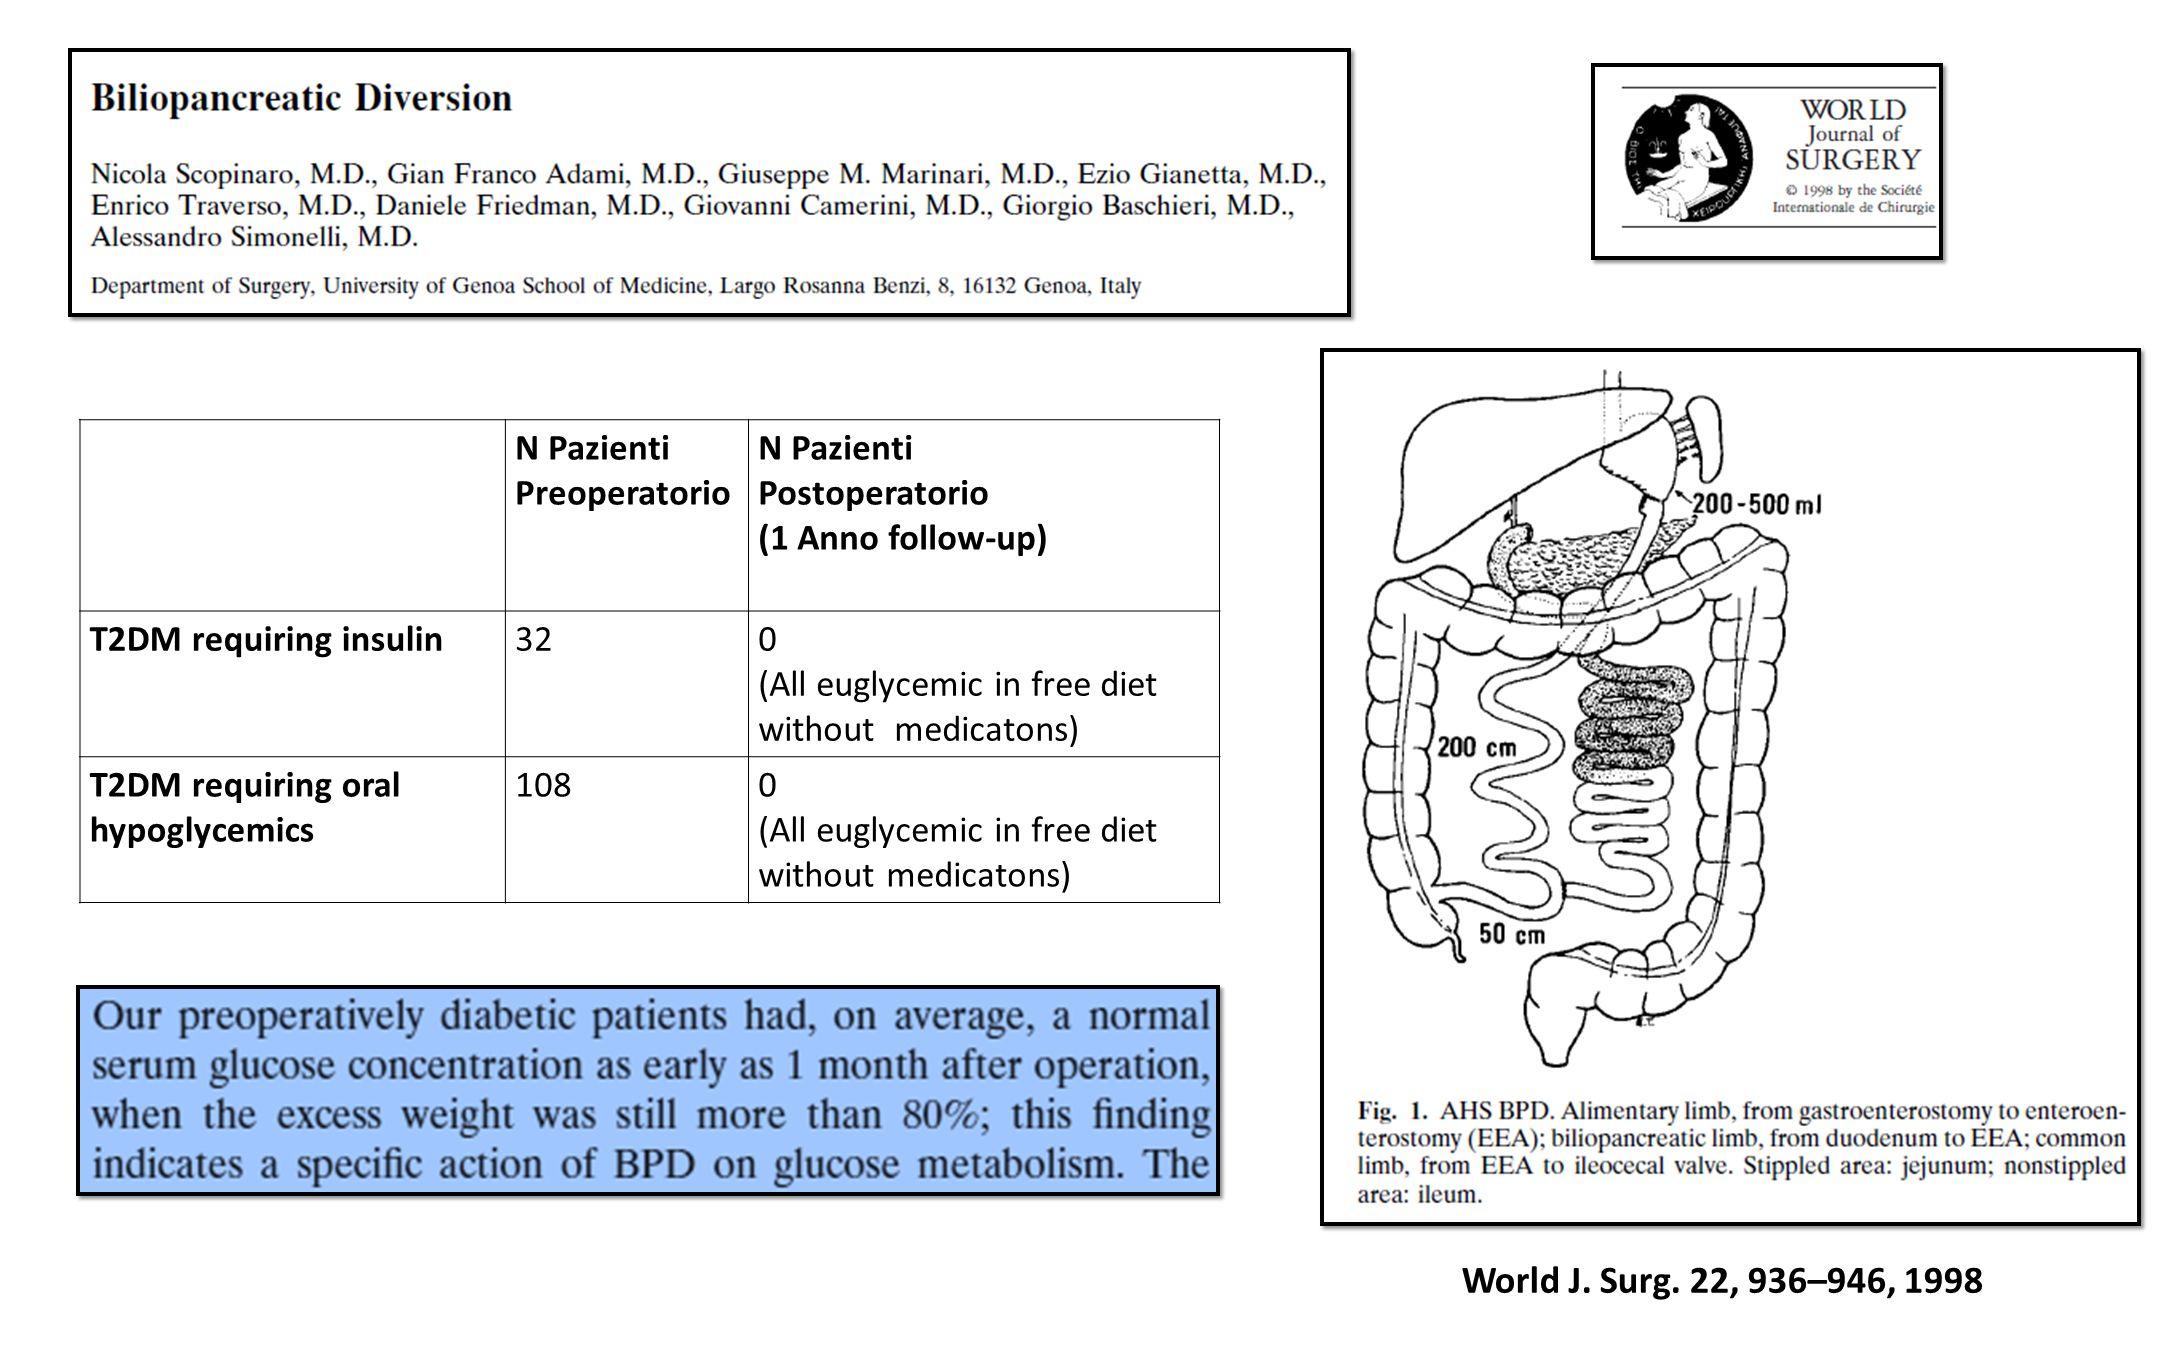 World J. Surg. 22, 936–946, 1998 N Pazienti Preoperatorio N Pazienti Postoperatorio (1 Anno follow-up) T2DM requiring insulin320 (All euglycemic in fr